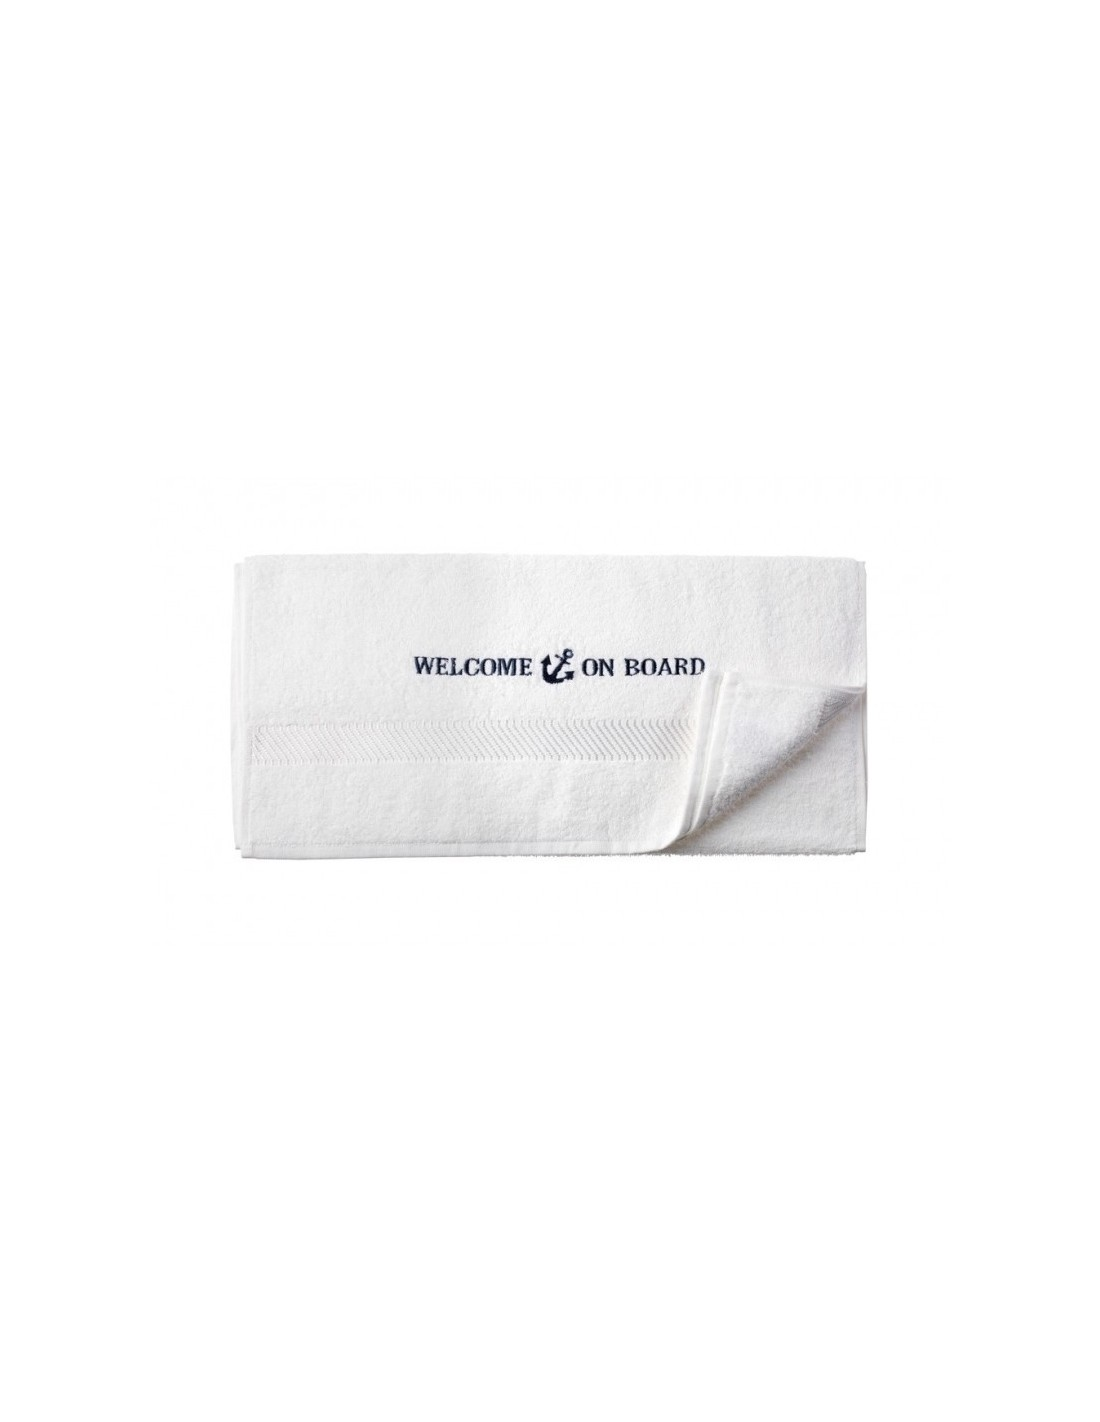 Handdoek - Wit - 50 x 100 cm - Welcome On Board - Textiel - 10149805